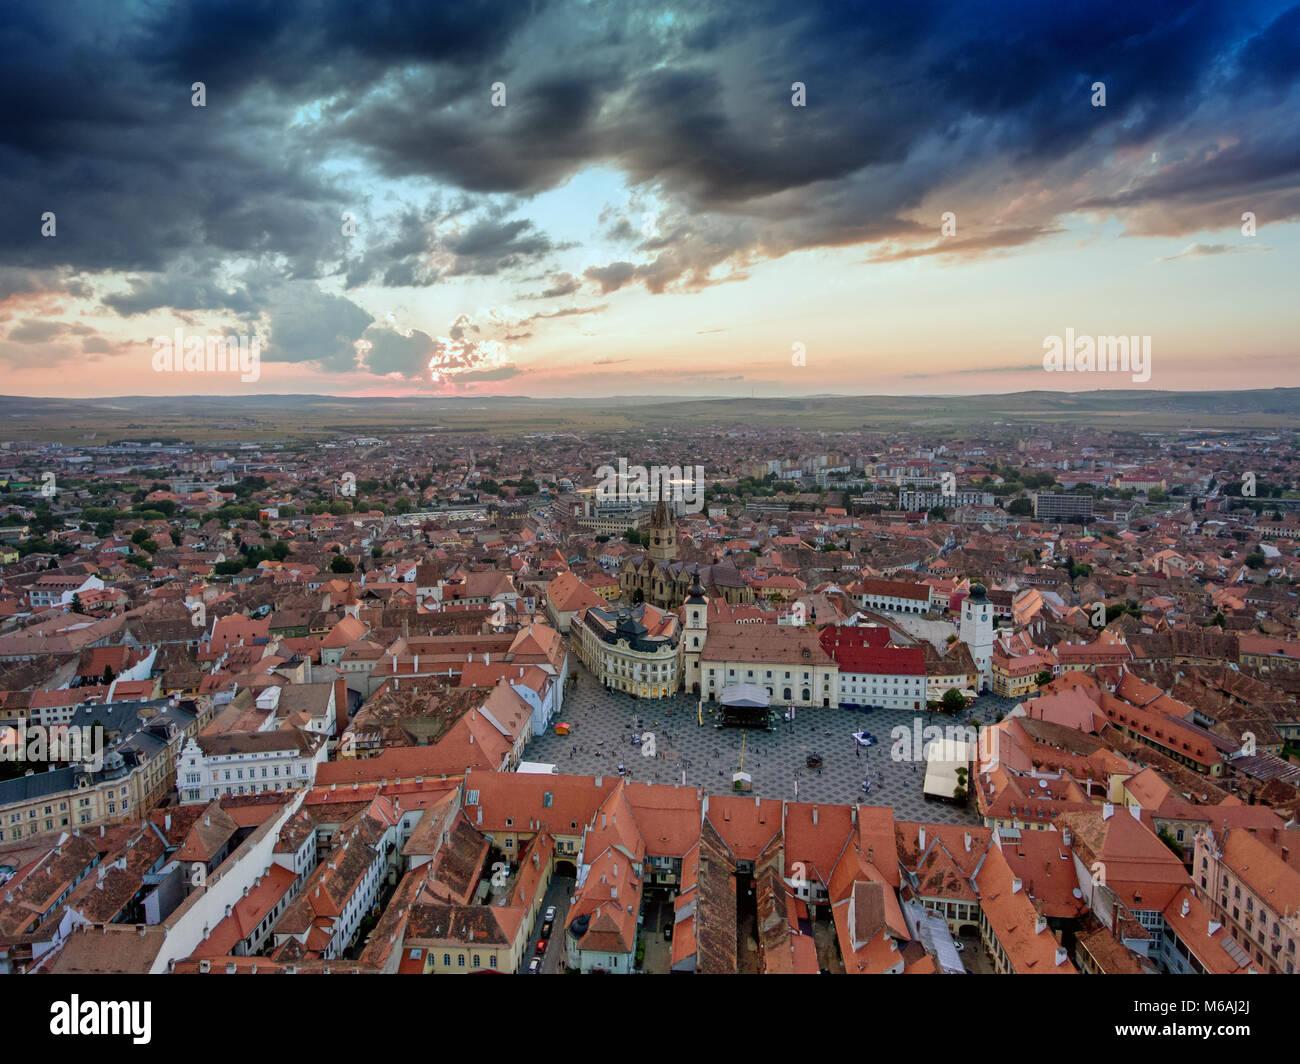 Aerial view of Sibiu, Tranylvania, Romania at sunset - Stock Image